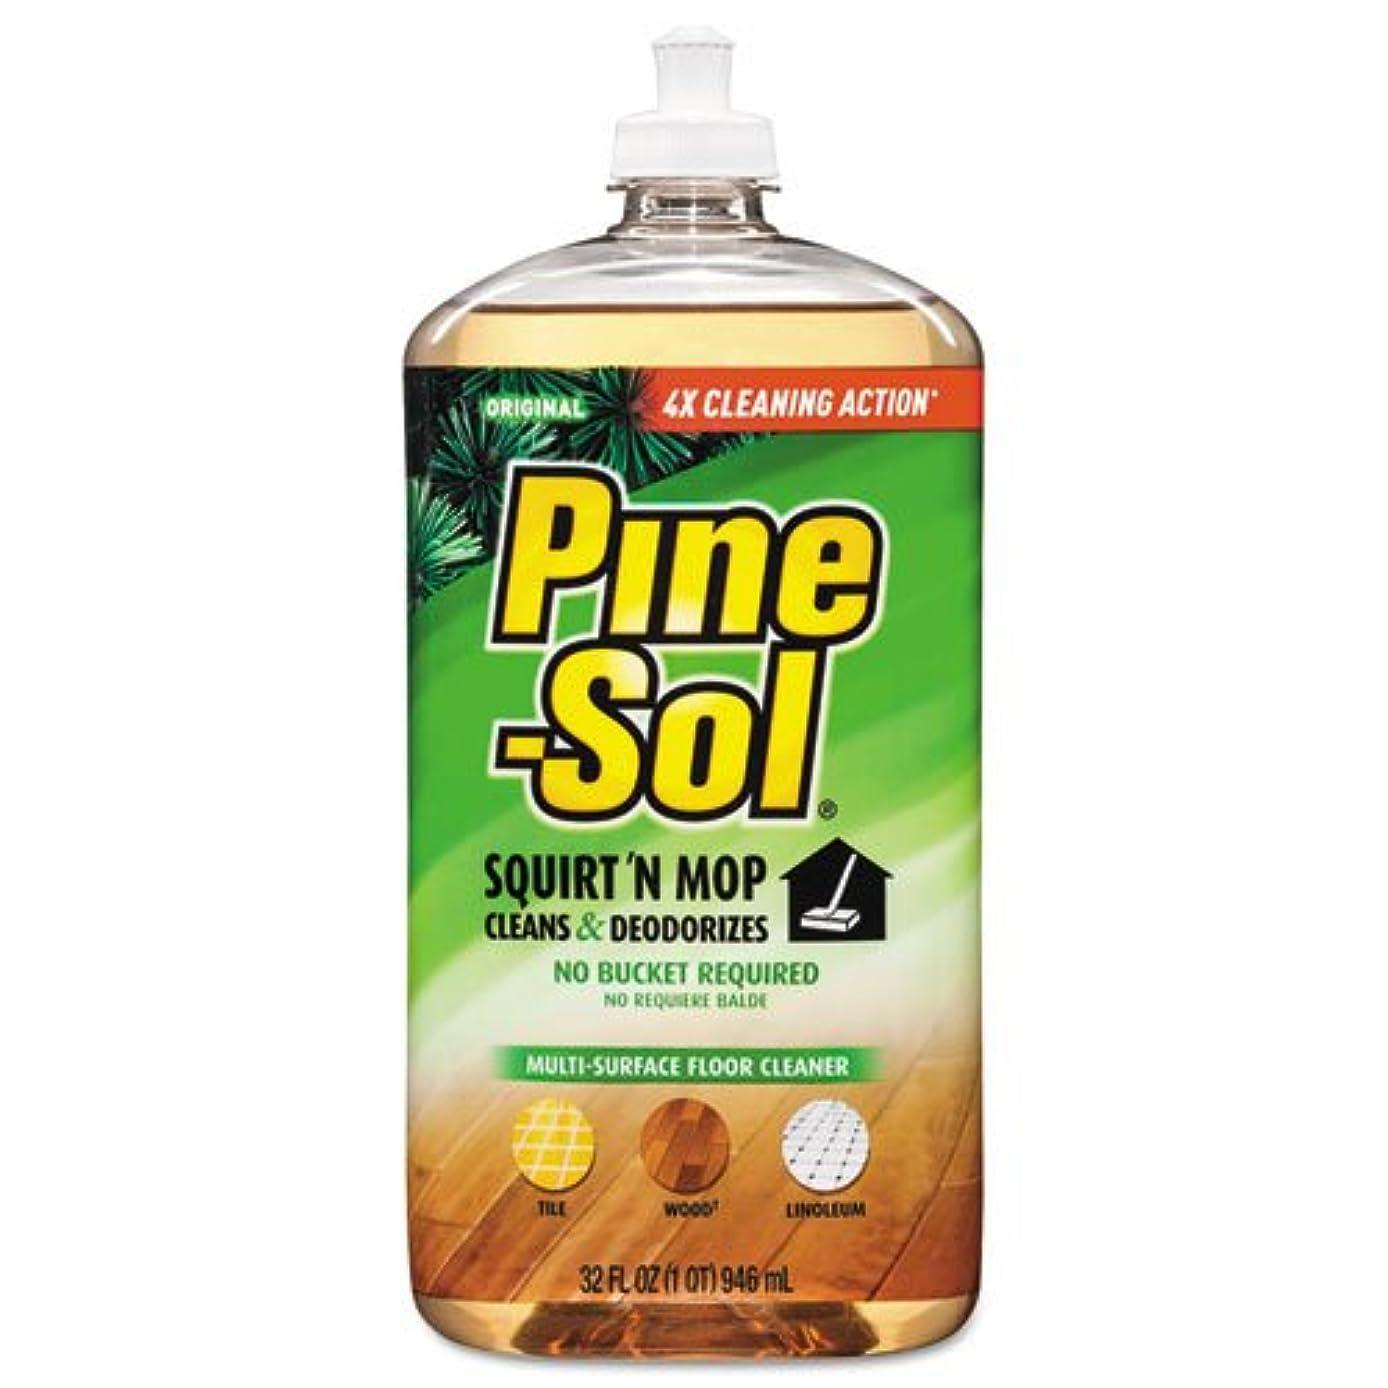 Squirt 'n Mop Multi-Surface Floor Cleaner, 32 oz Bottle, Pine Scent